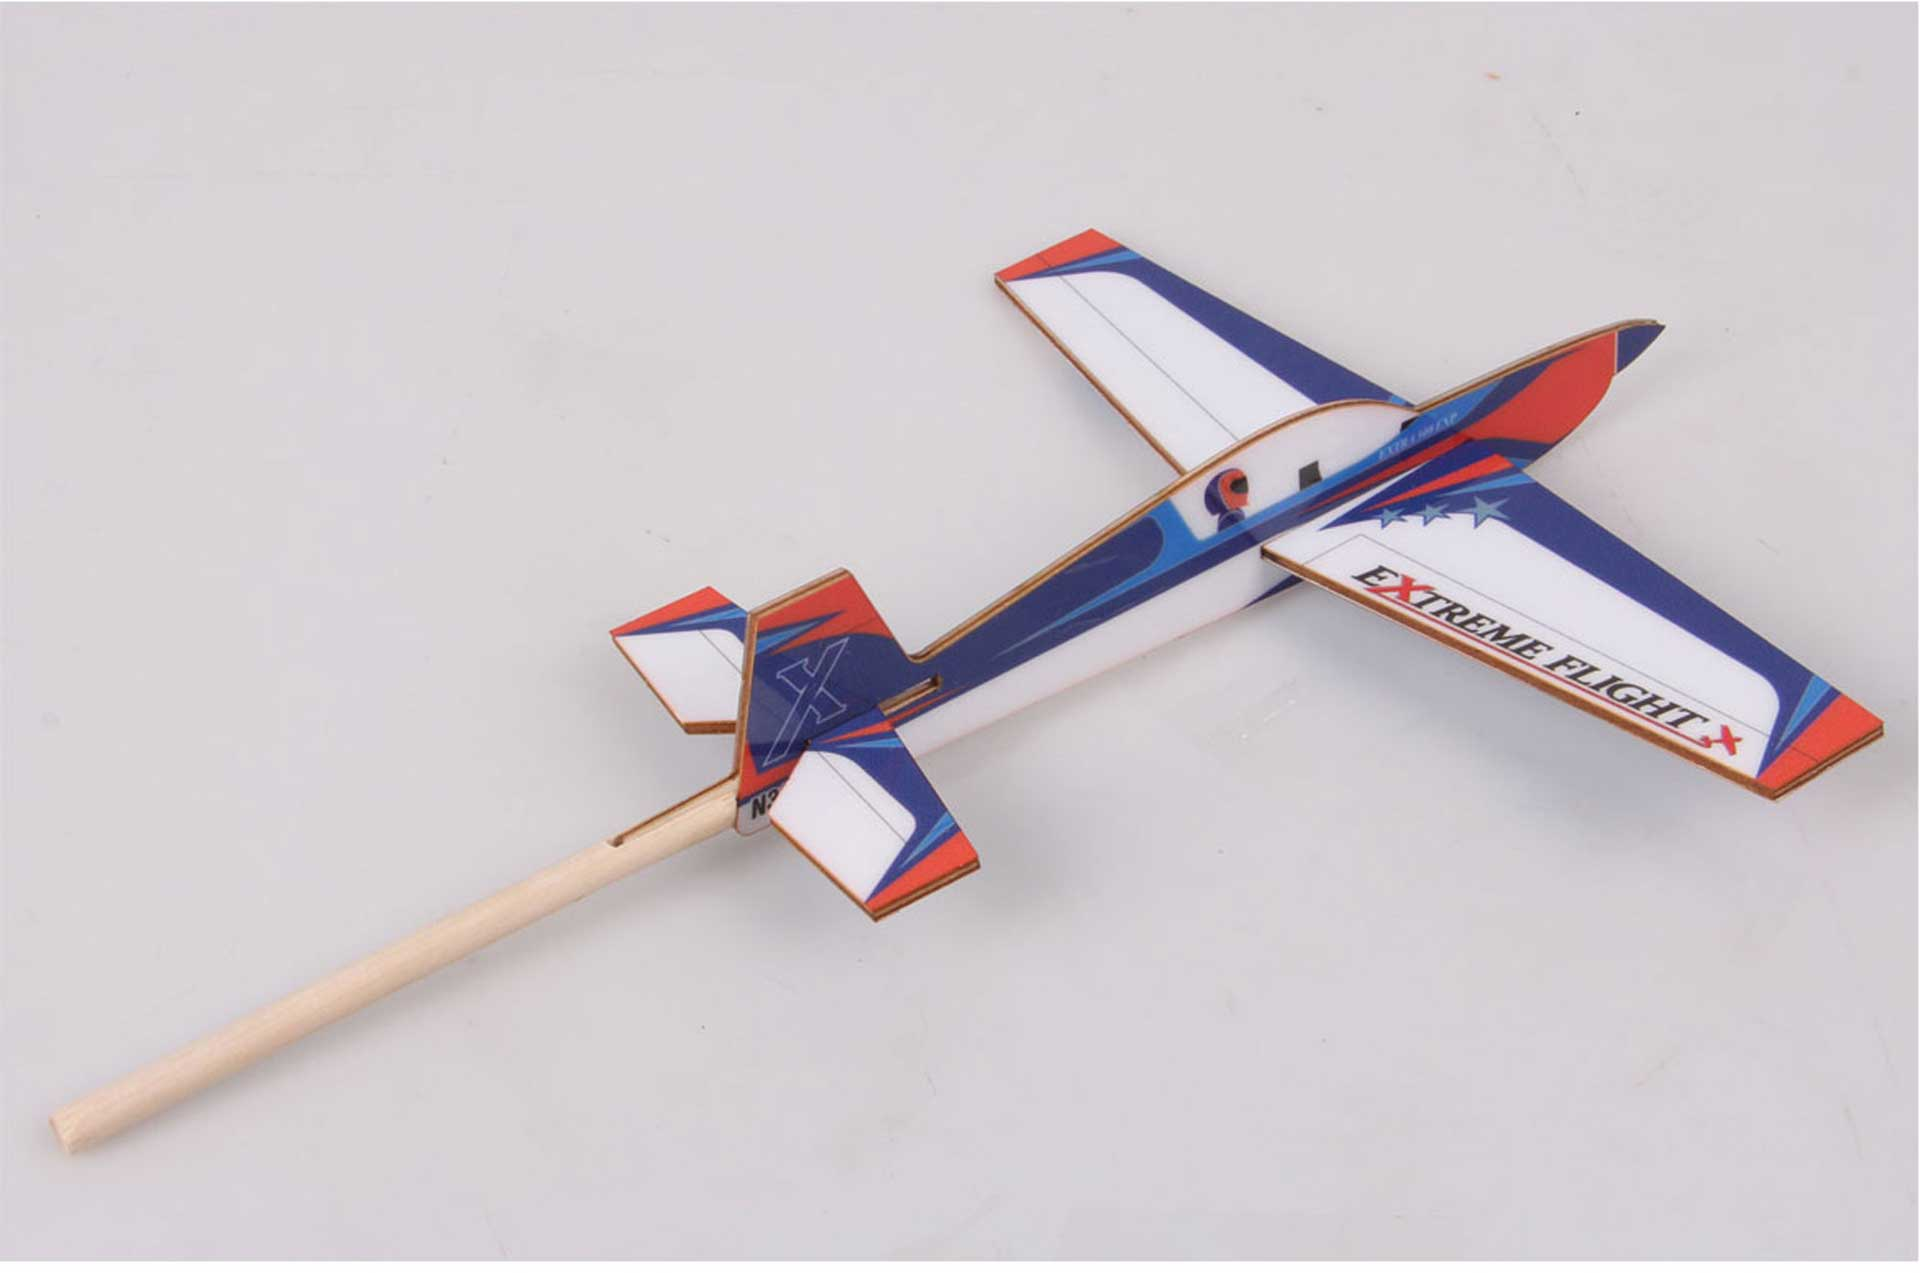 EXTREMEFLIGHT-RC STICK PLANE EXTRA 300 175MM Weiss/Blau/Orange